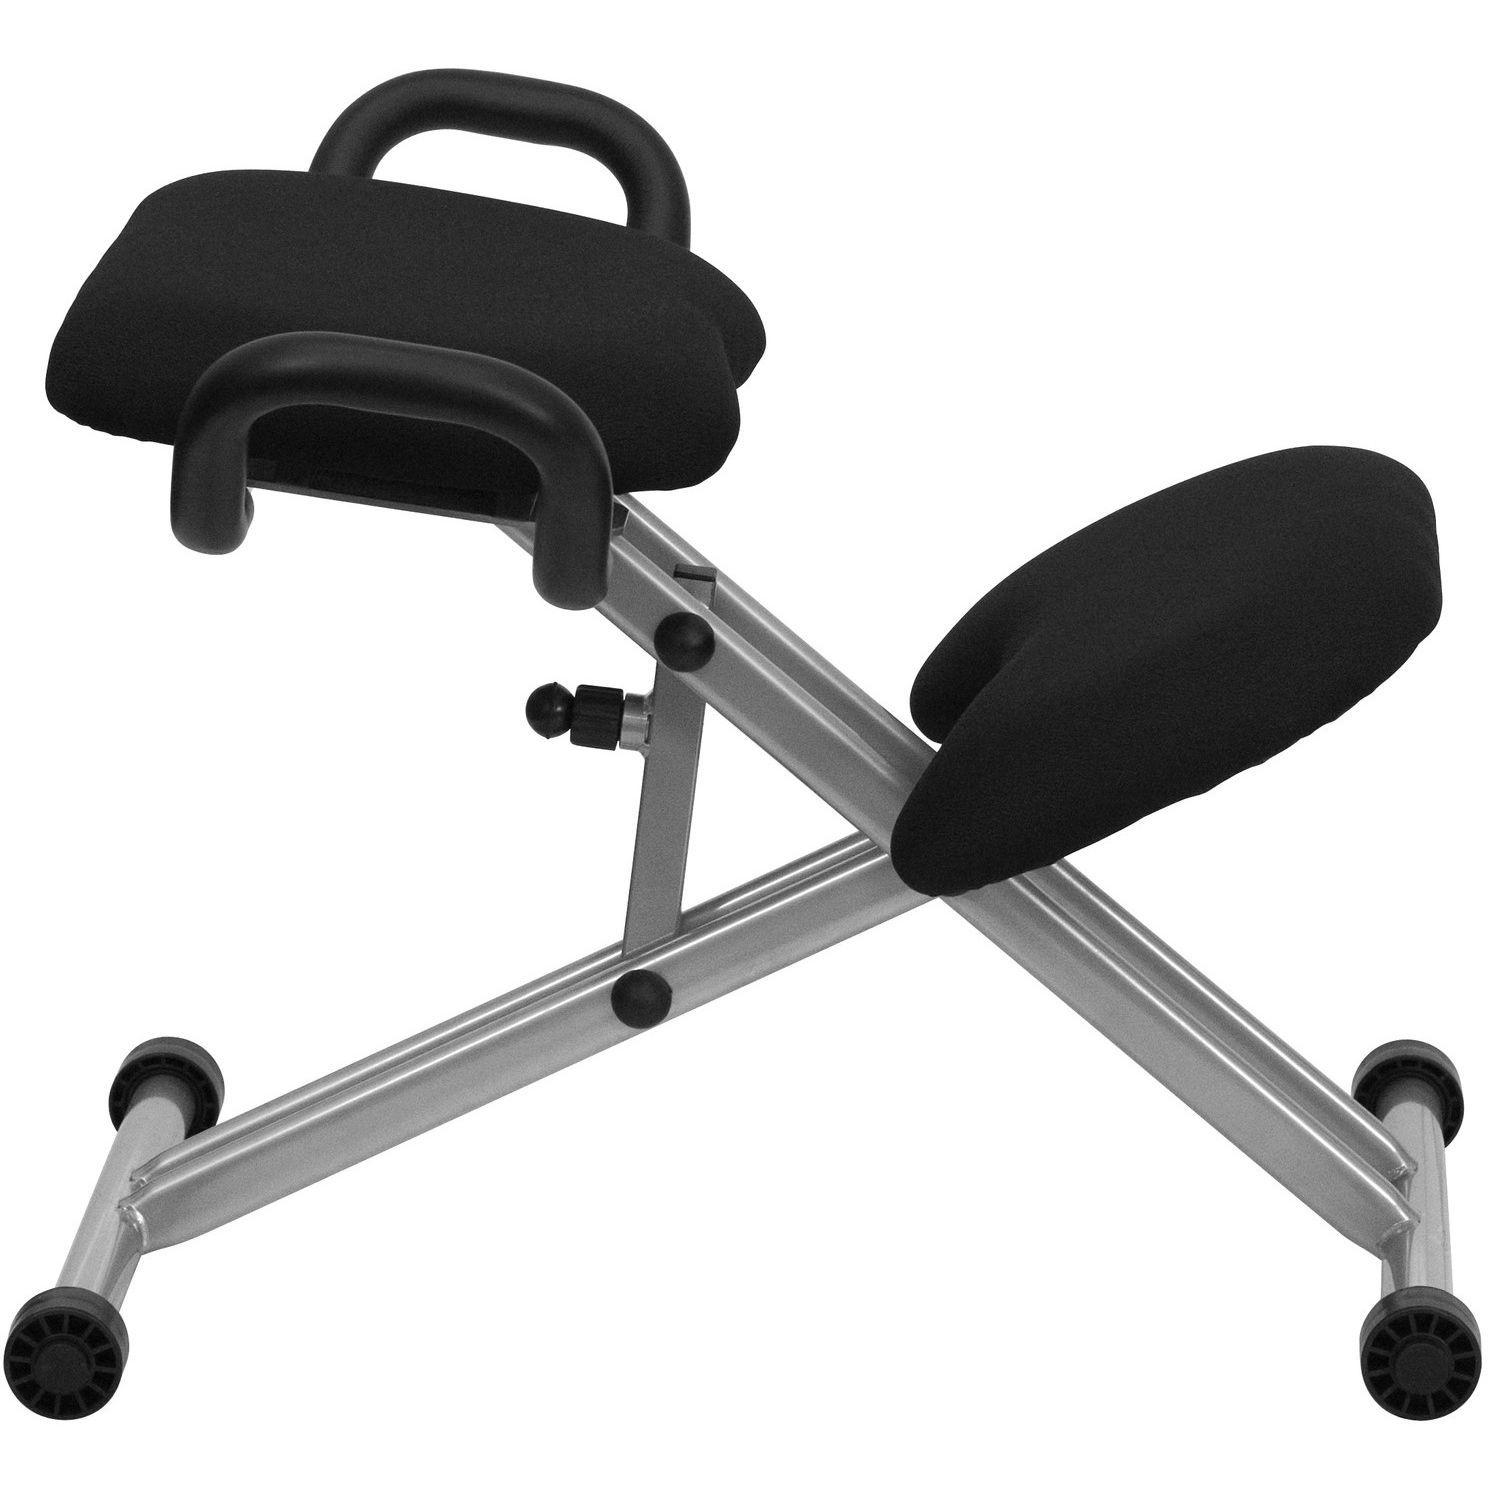 Ergonomic Kneeling Chair with Handles Меблі